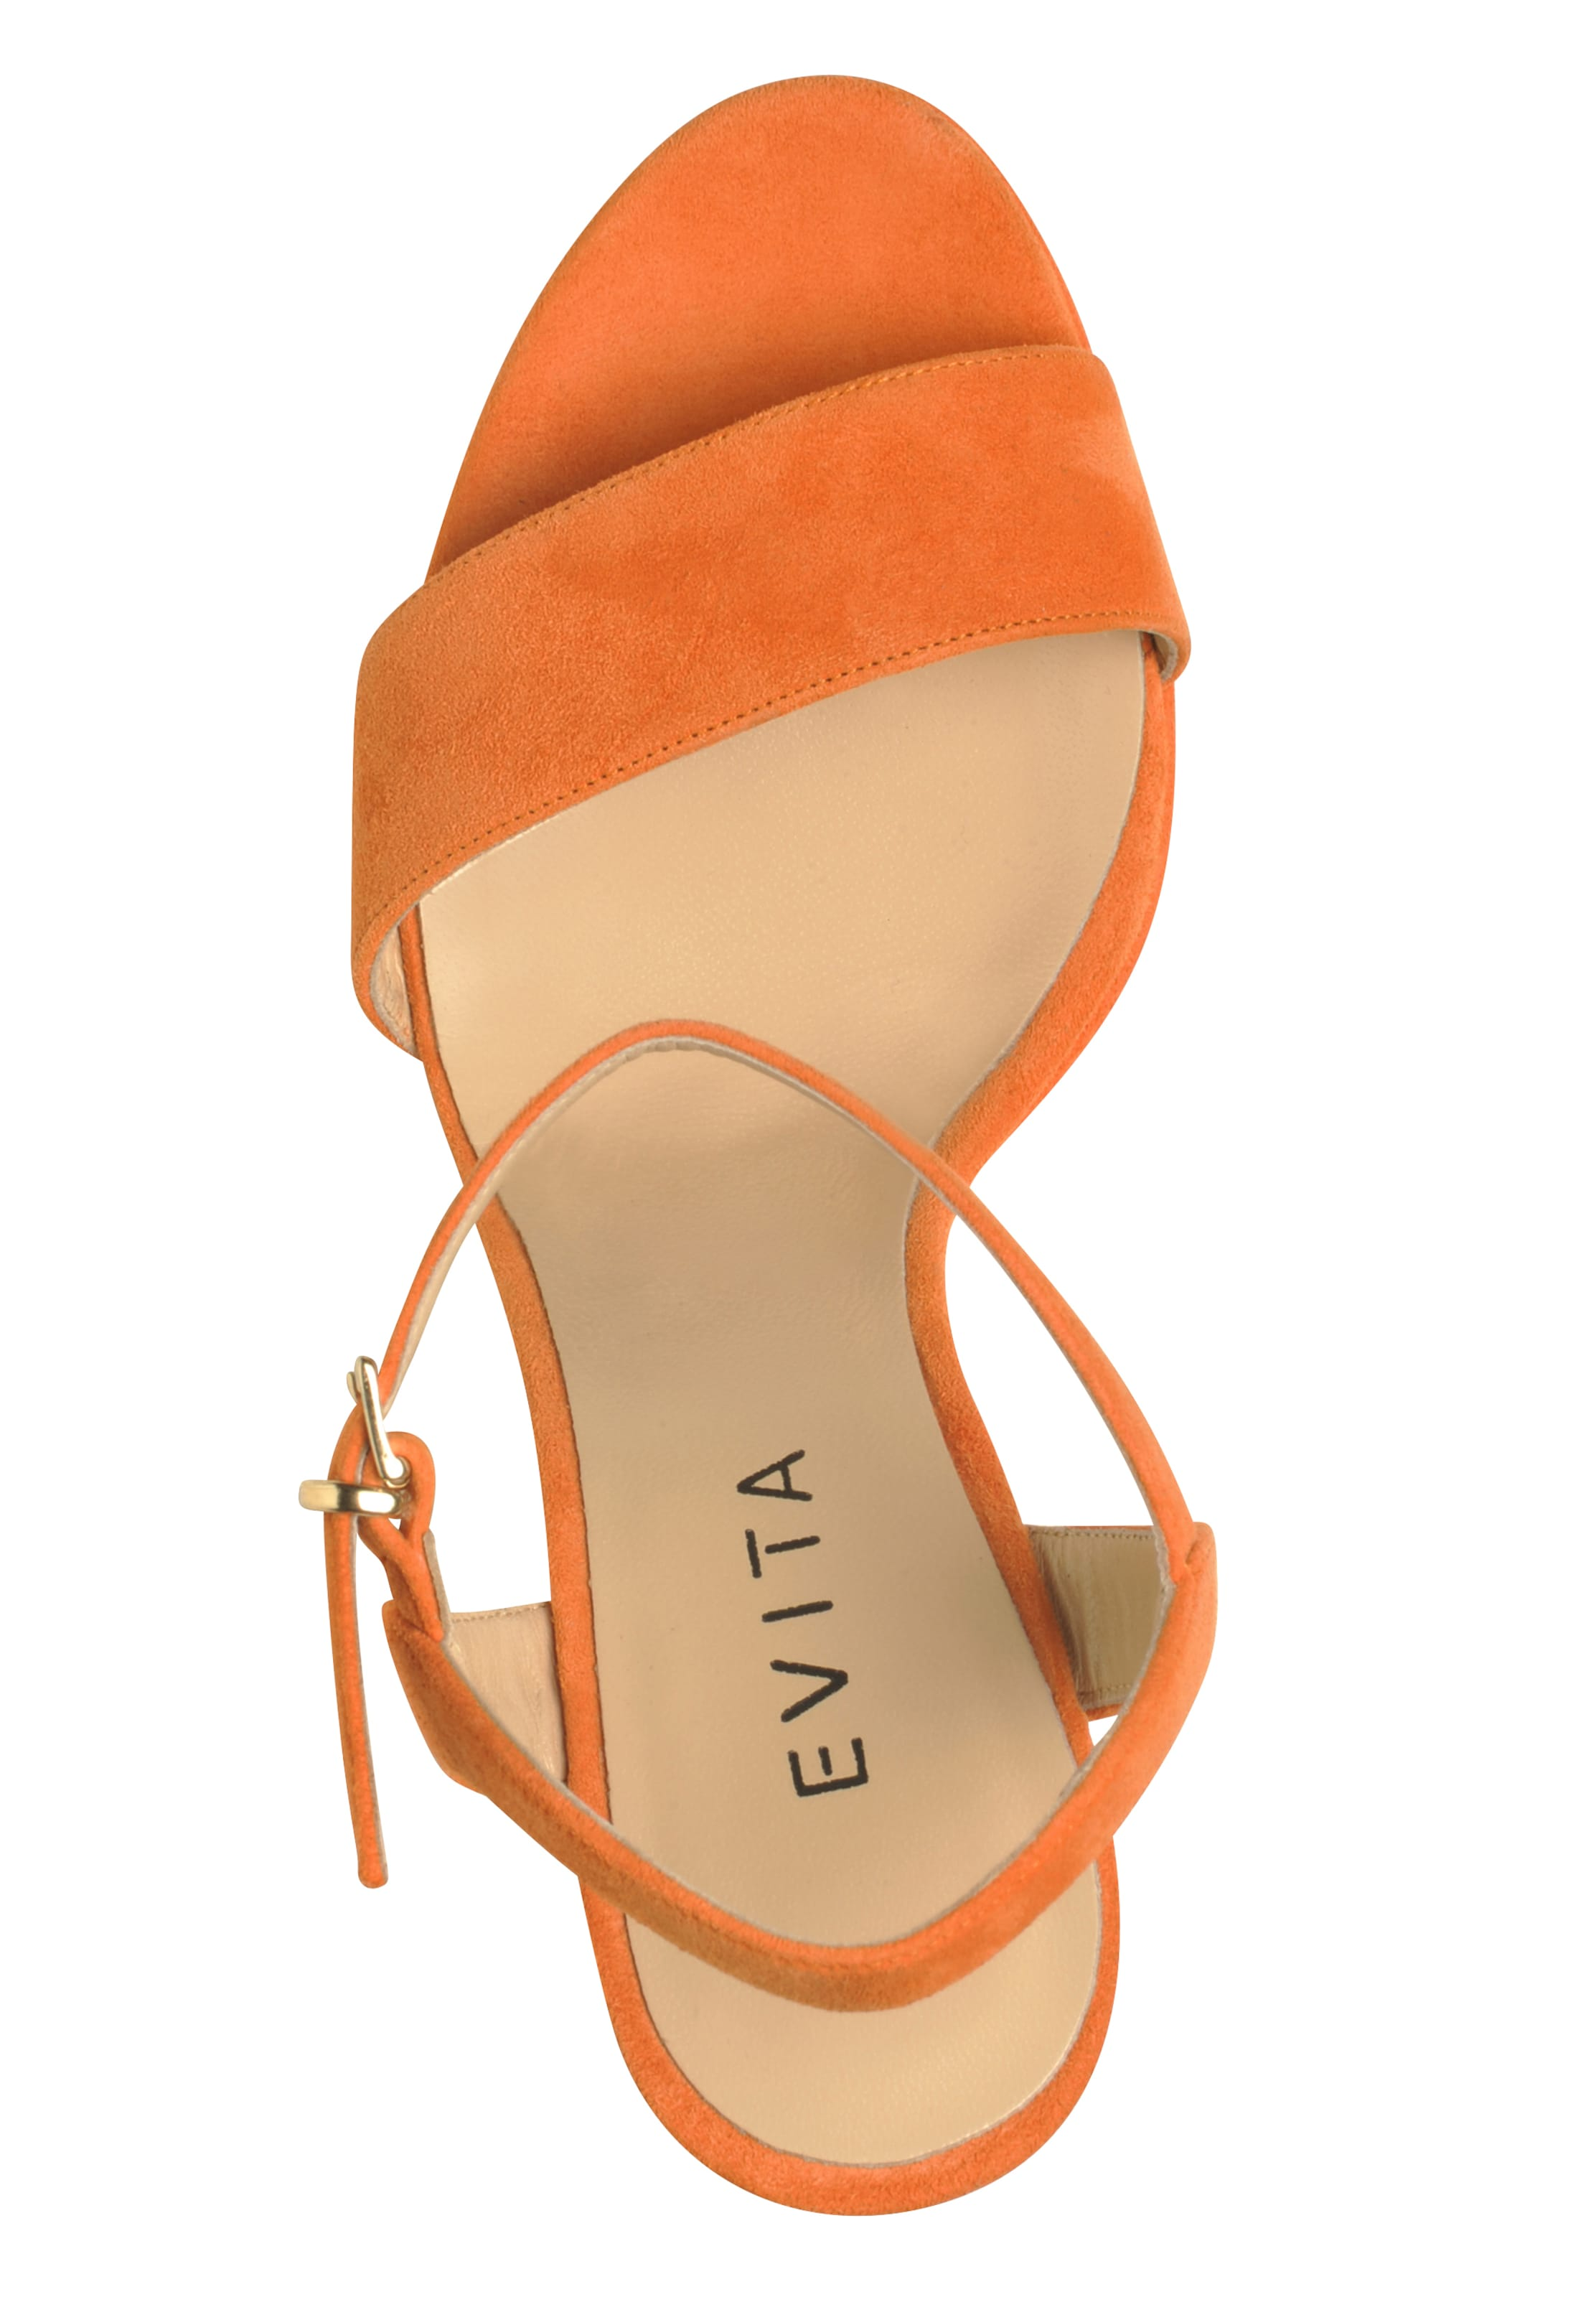 Damen Evita Sandalette Damen Sandalette Dunkelorange Evita In c1JFlK